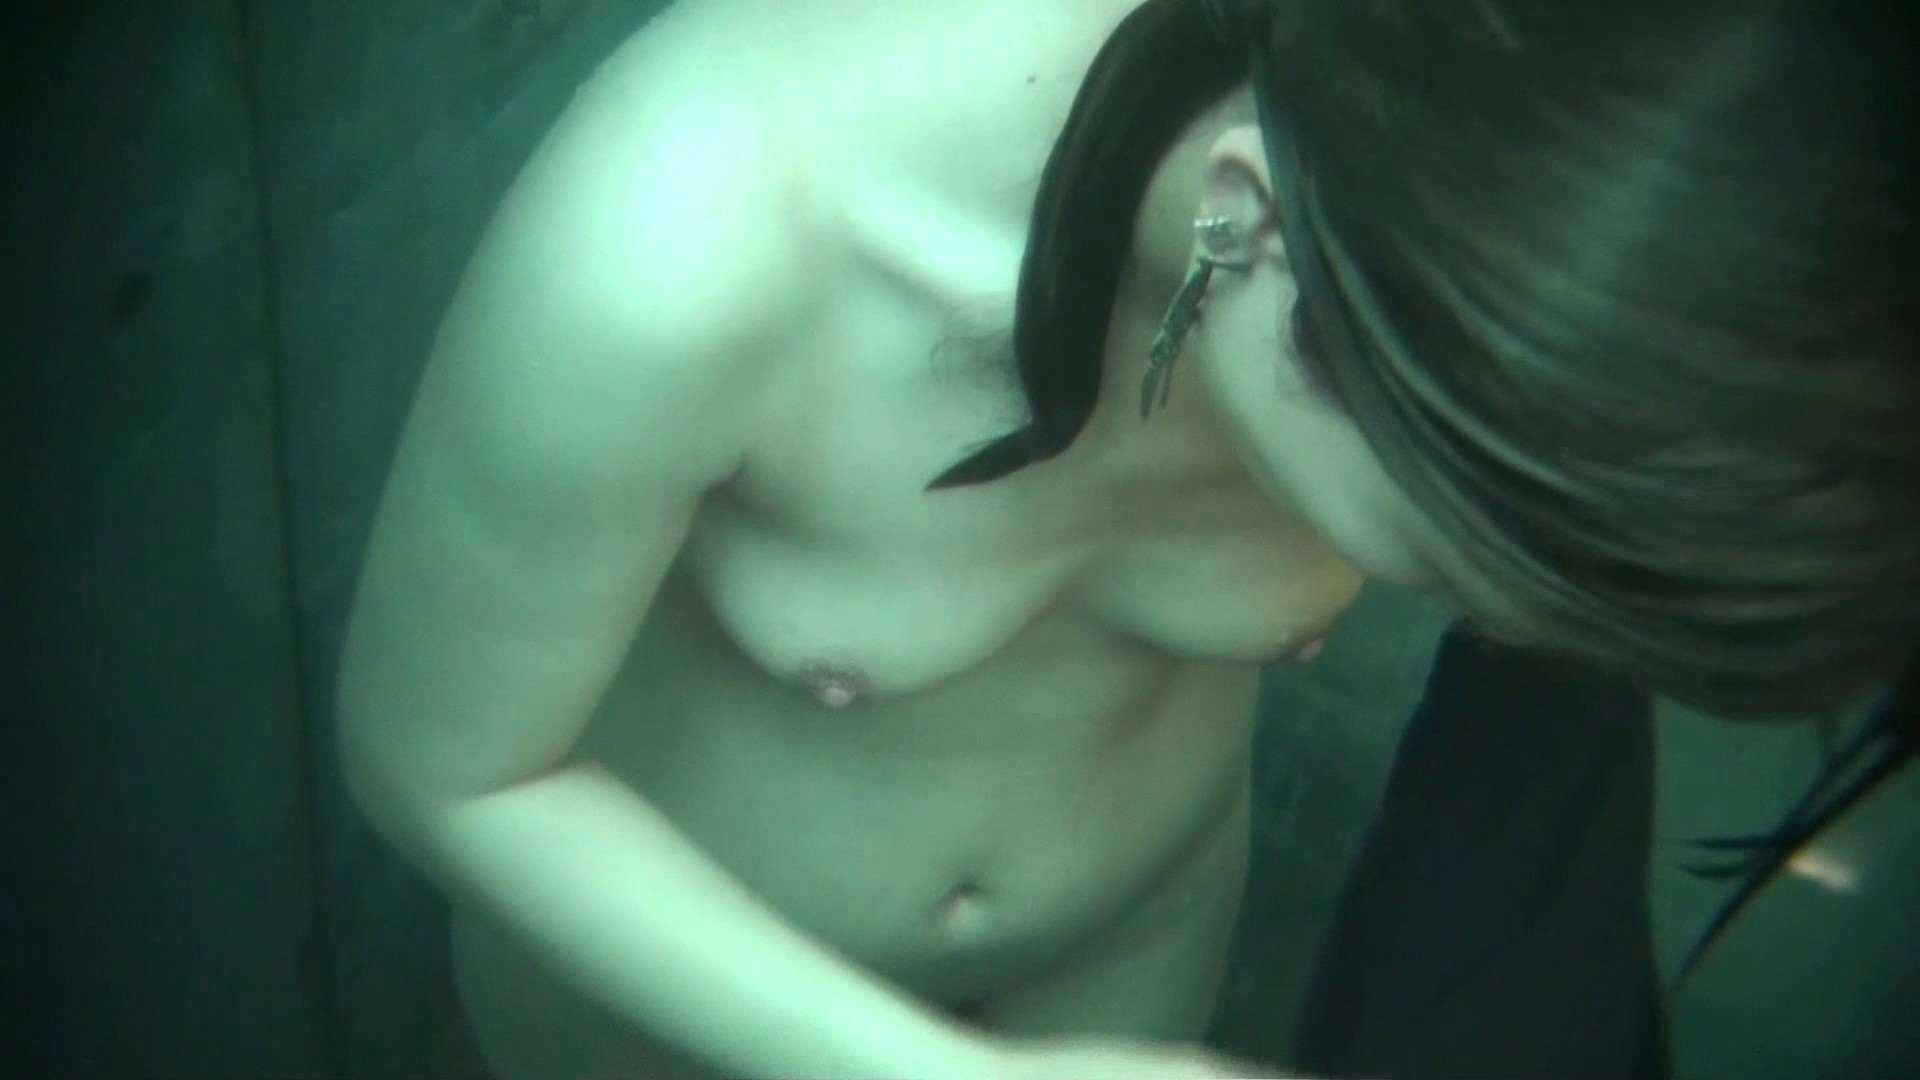 Vol.12 女性の性器には予想外の砂が混入しているようです。 シャワー中 | 高画質  96連発 78